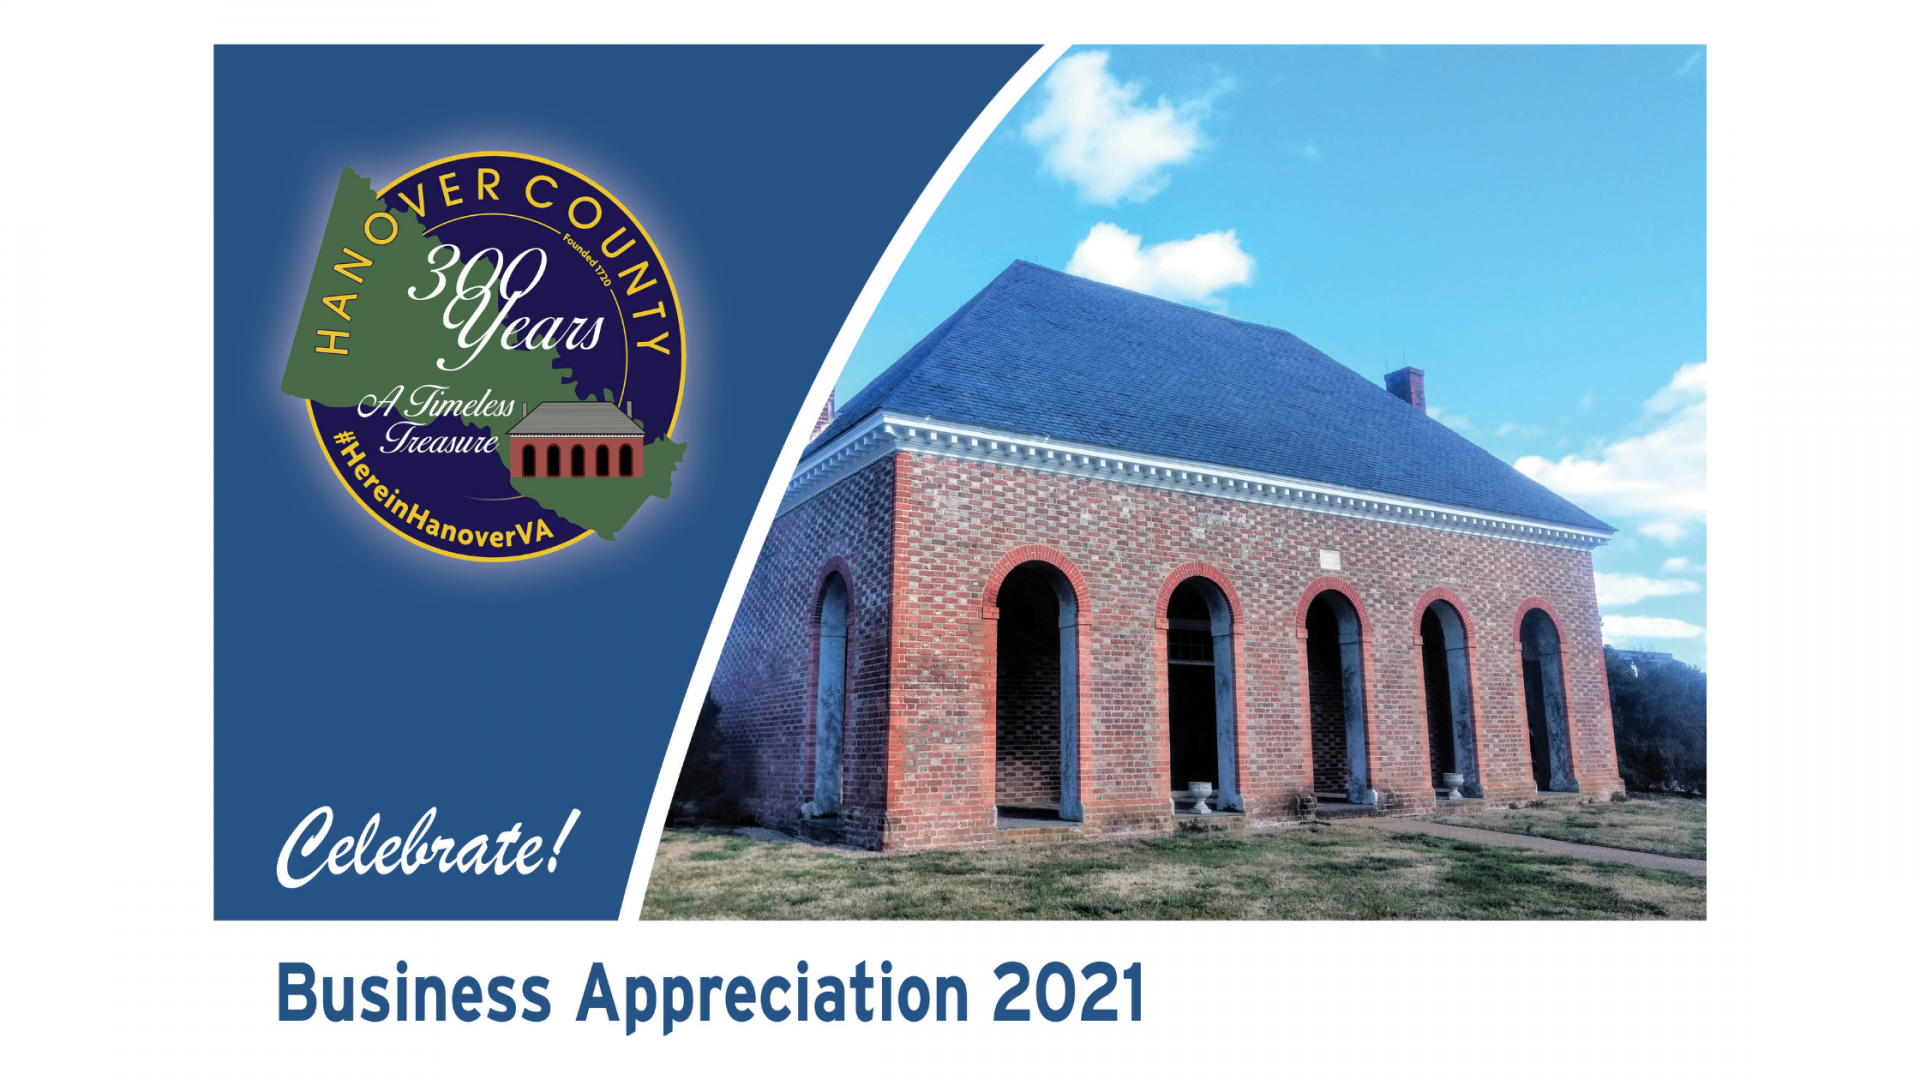 Business Appreciation 2021